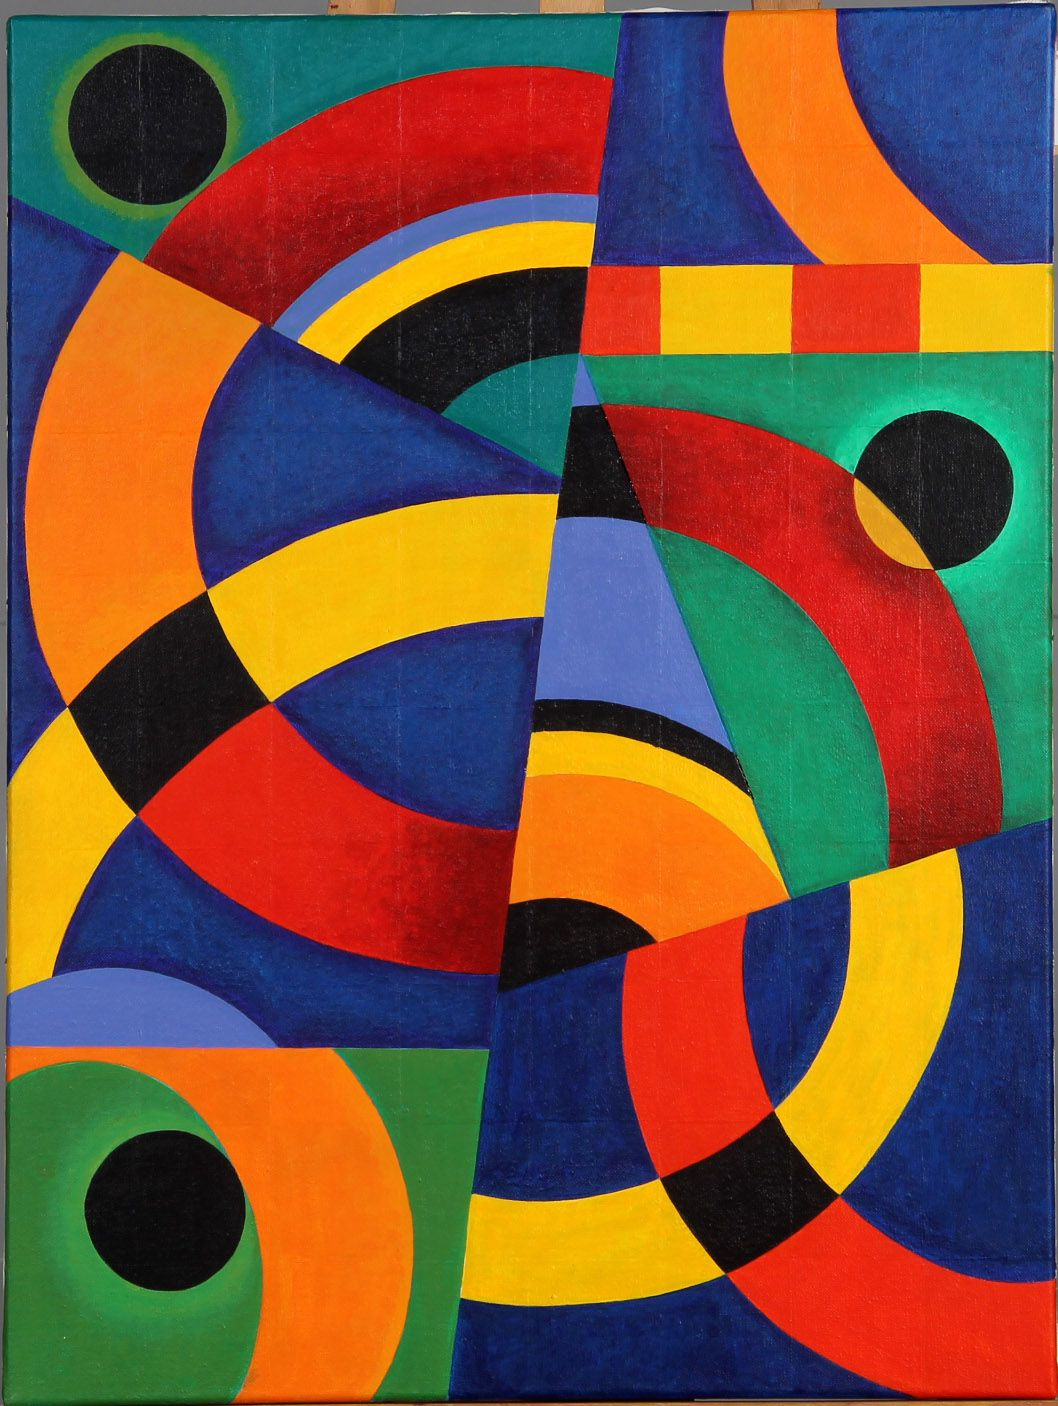 kavous vesal komposition moderne abstrakte kunst malerei kunstproduktion kunstdrucke amazon leinwandbilder abstrakt